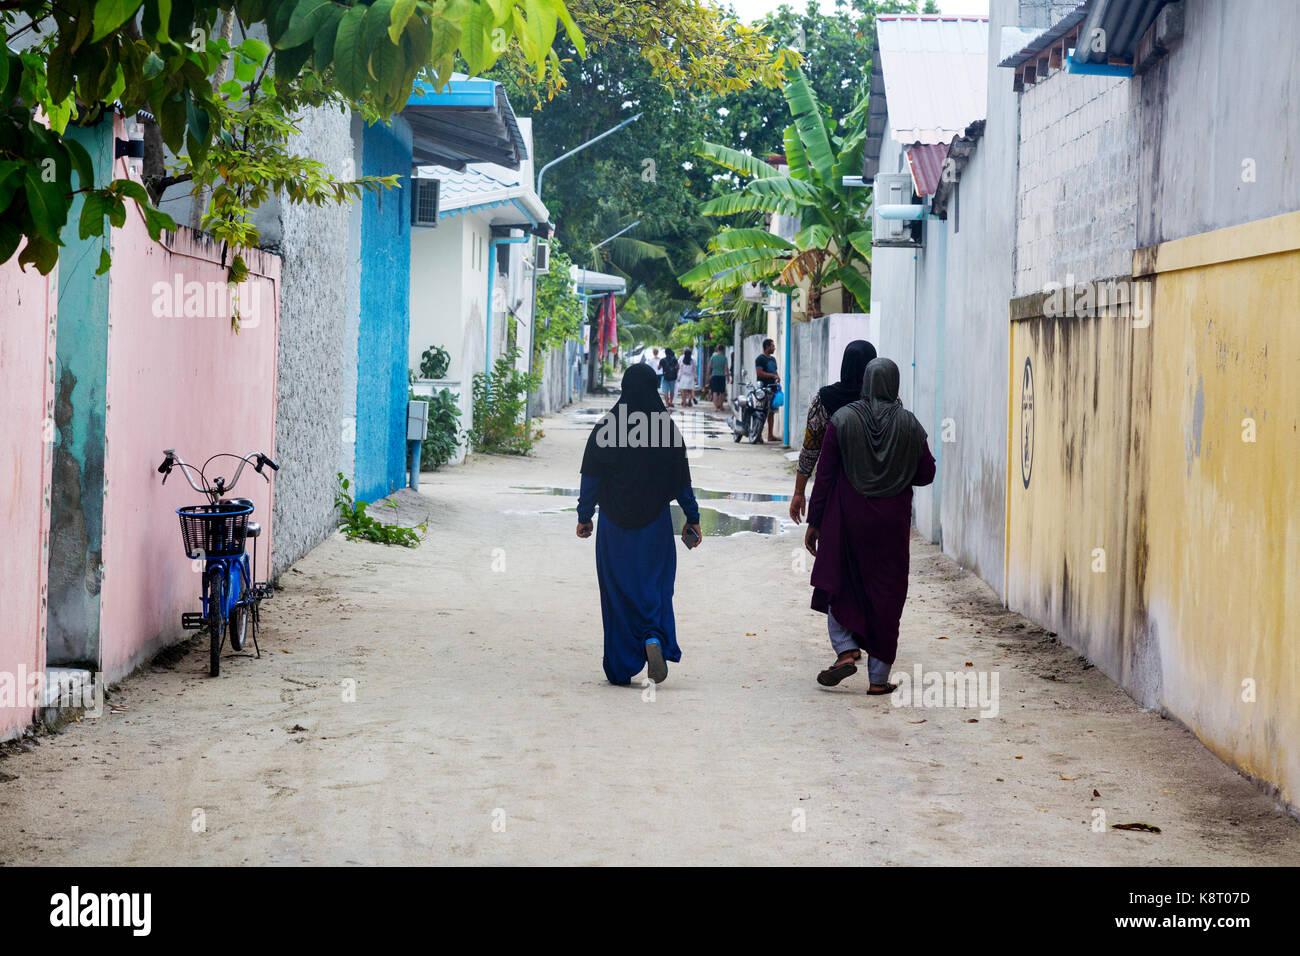 Local muslim women walking in the village, Rasdhoo island, the Maldives, Asia - Stock Image